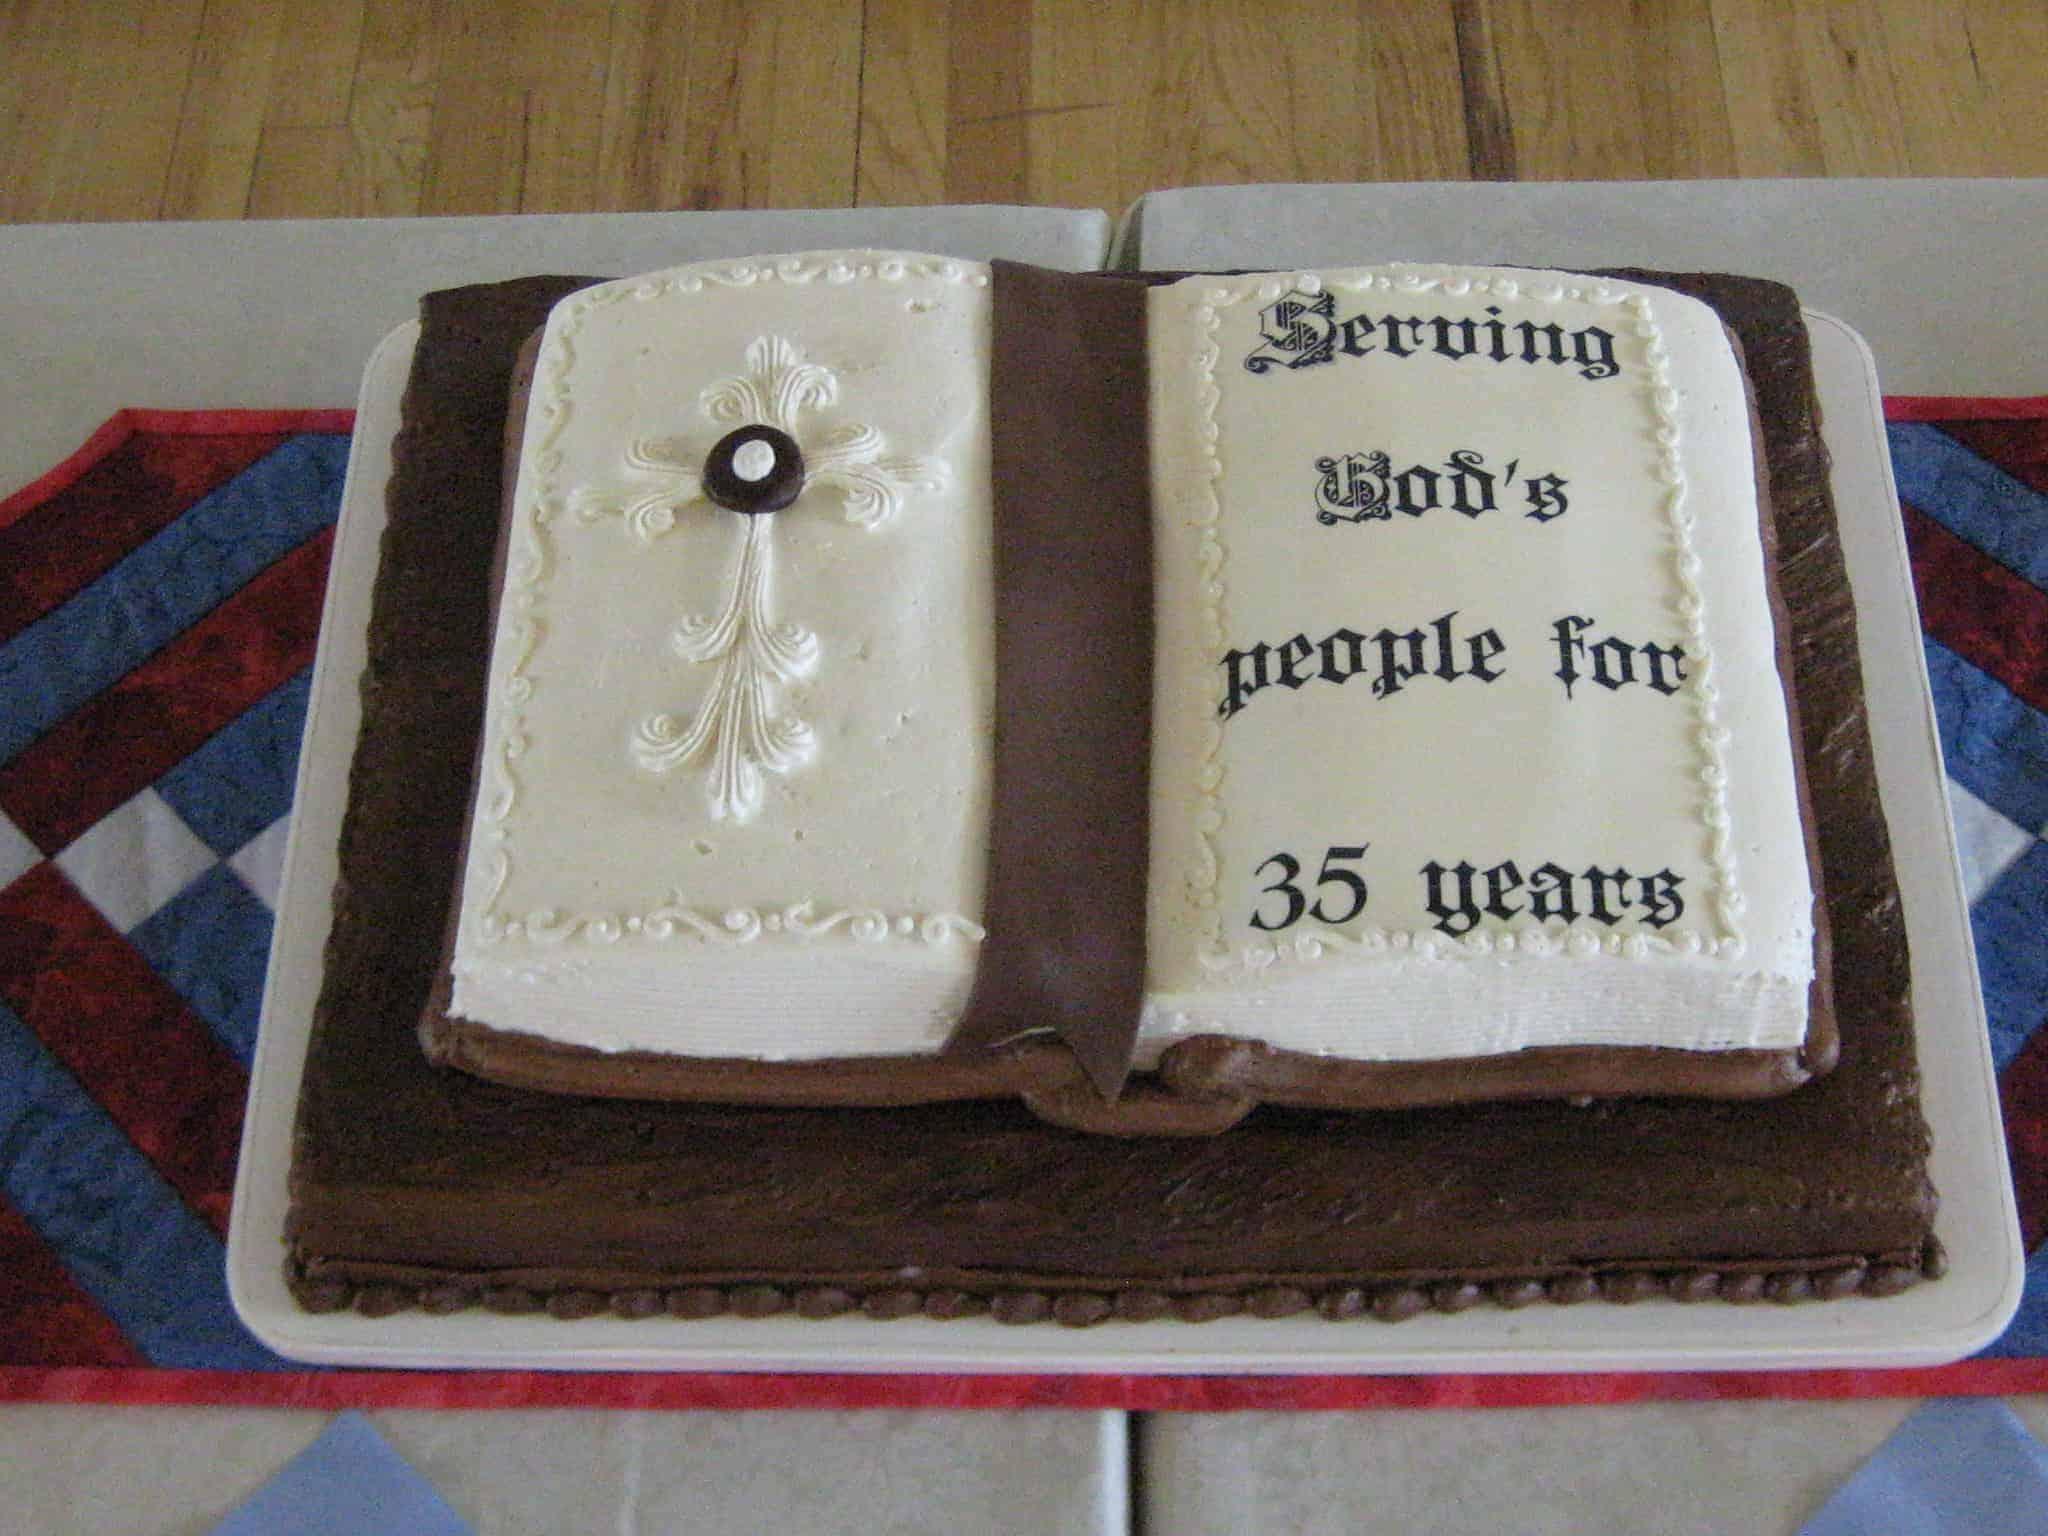 The Makery Cake Company Bible Cake